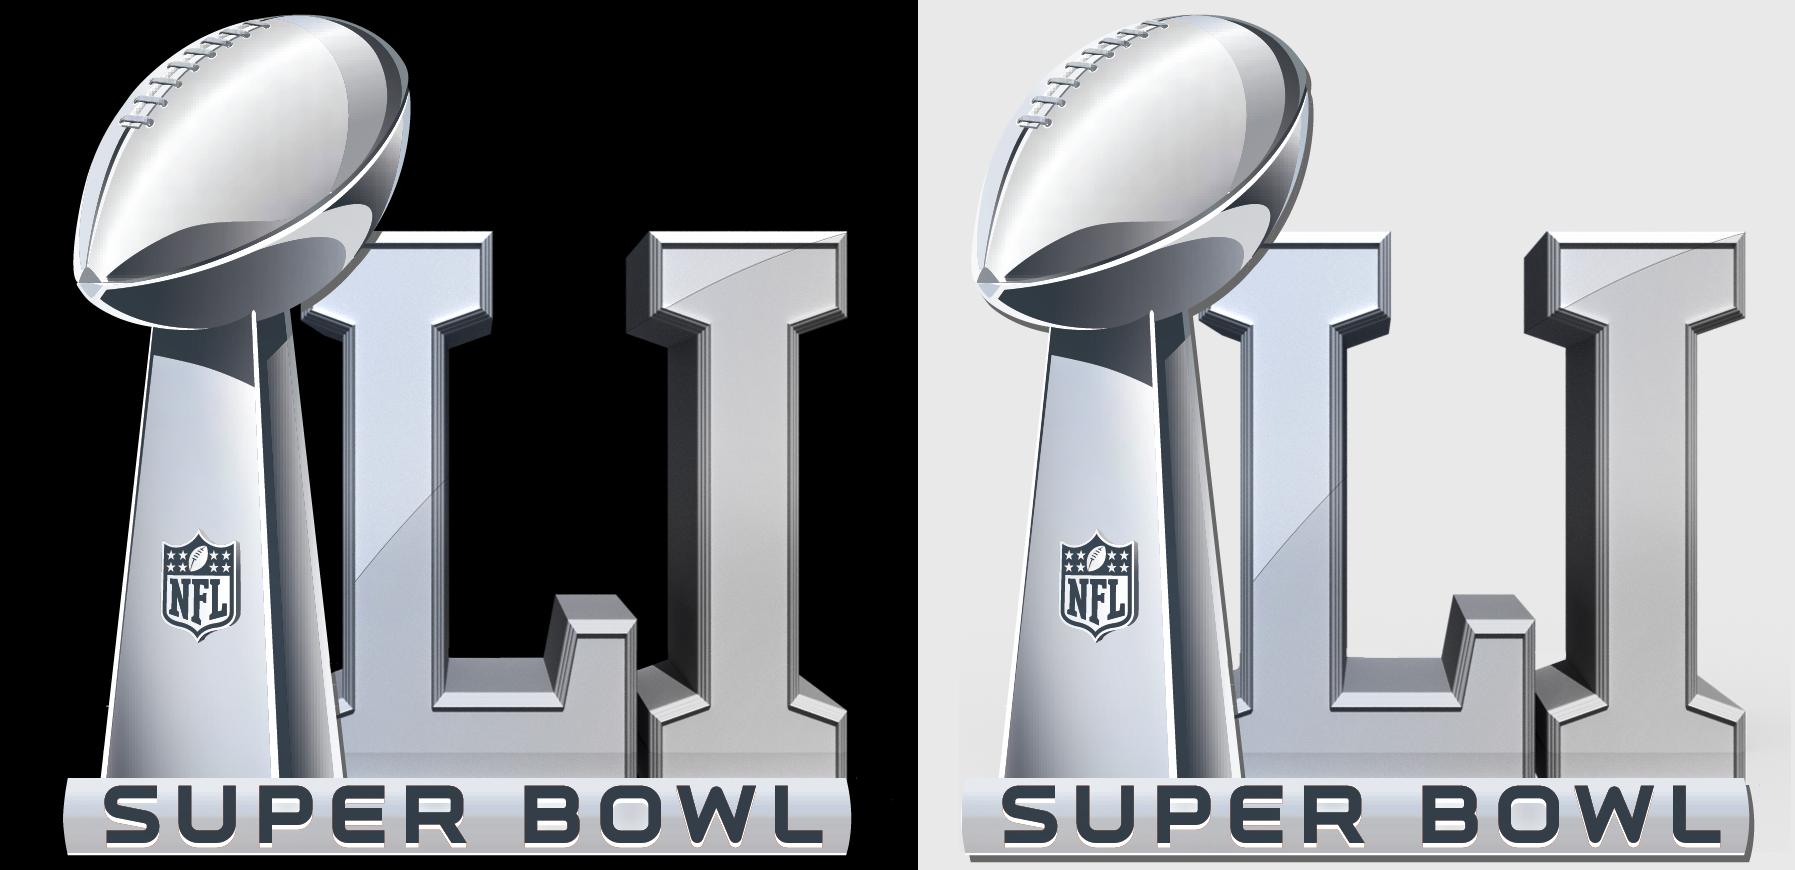 Nd8Mrev.png - Super Bowl Li, Transparent background PNG HD thumbnail